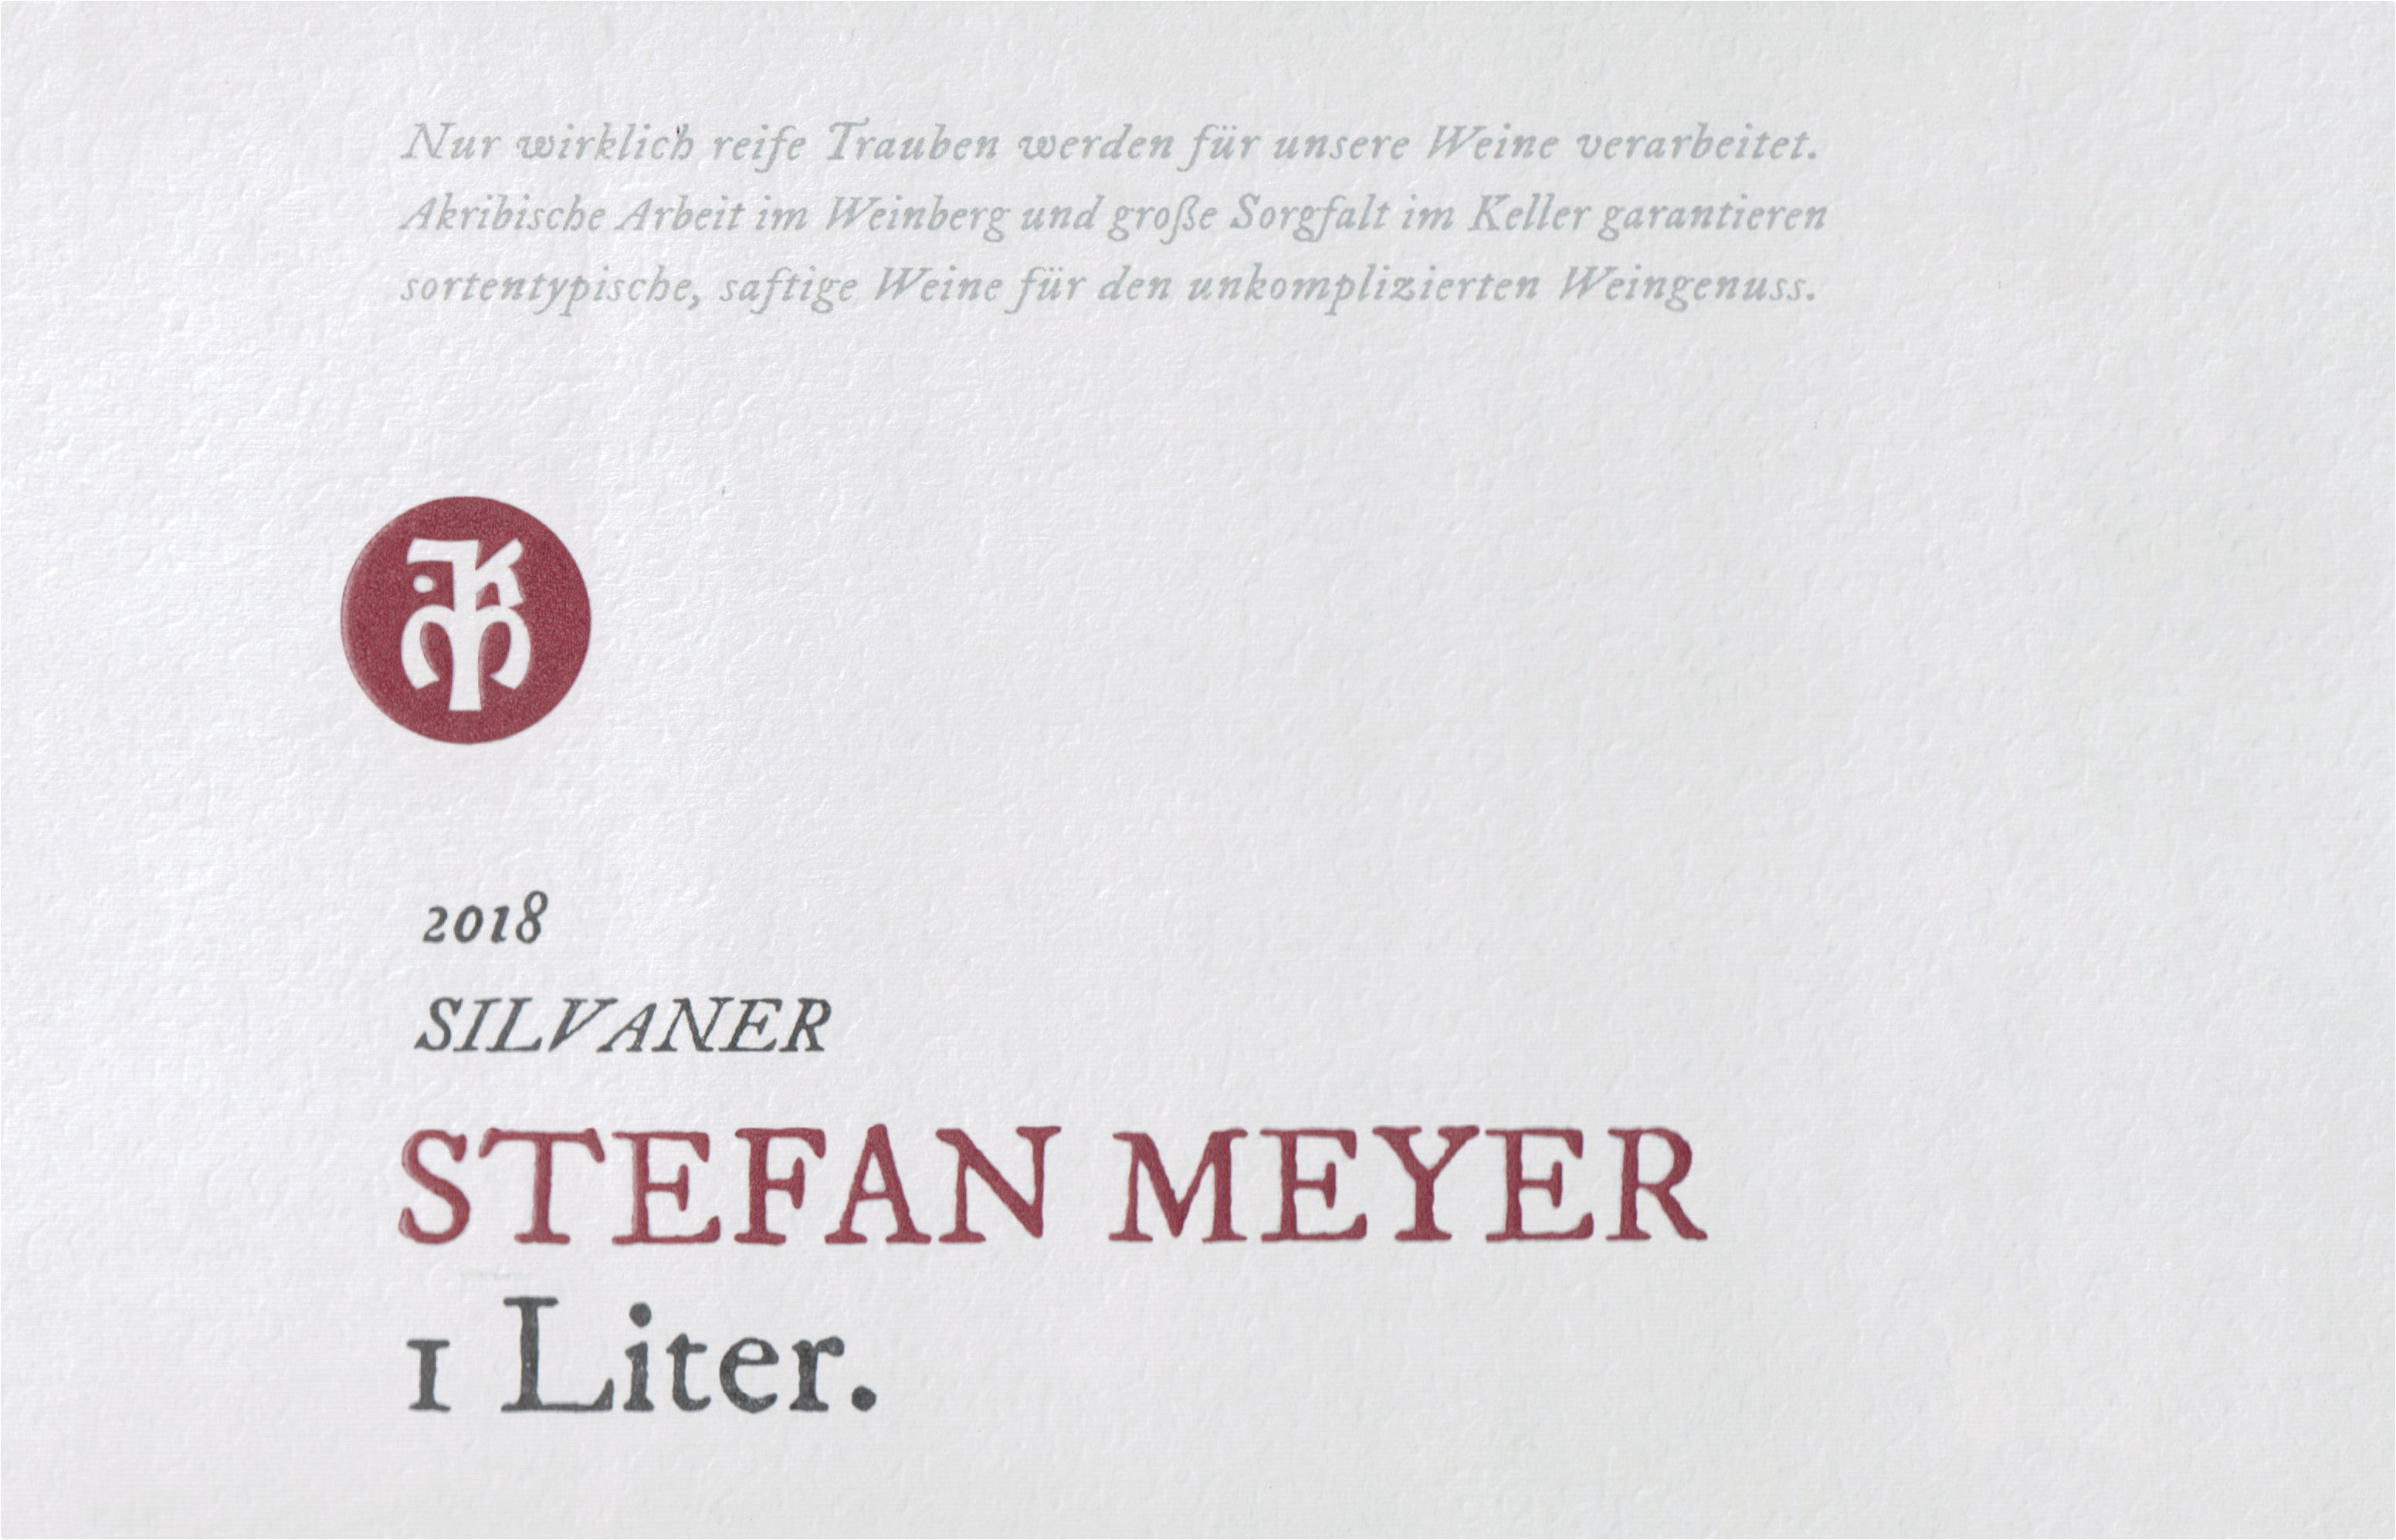 Stefan Meyer Silvaner Liter 2018